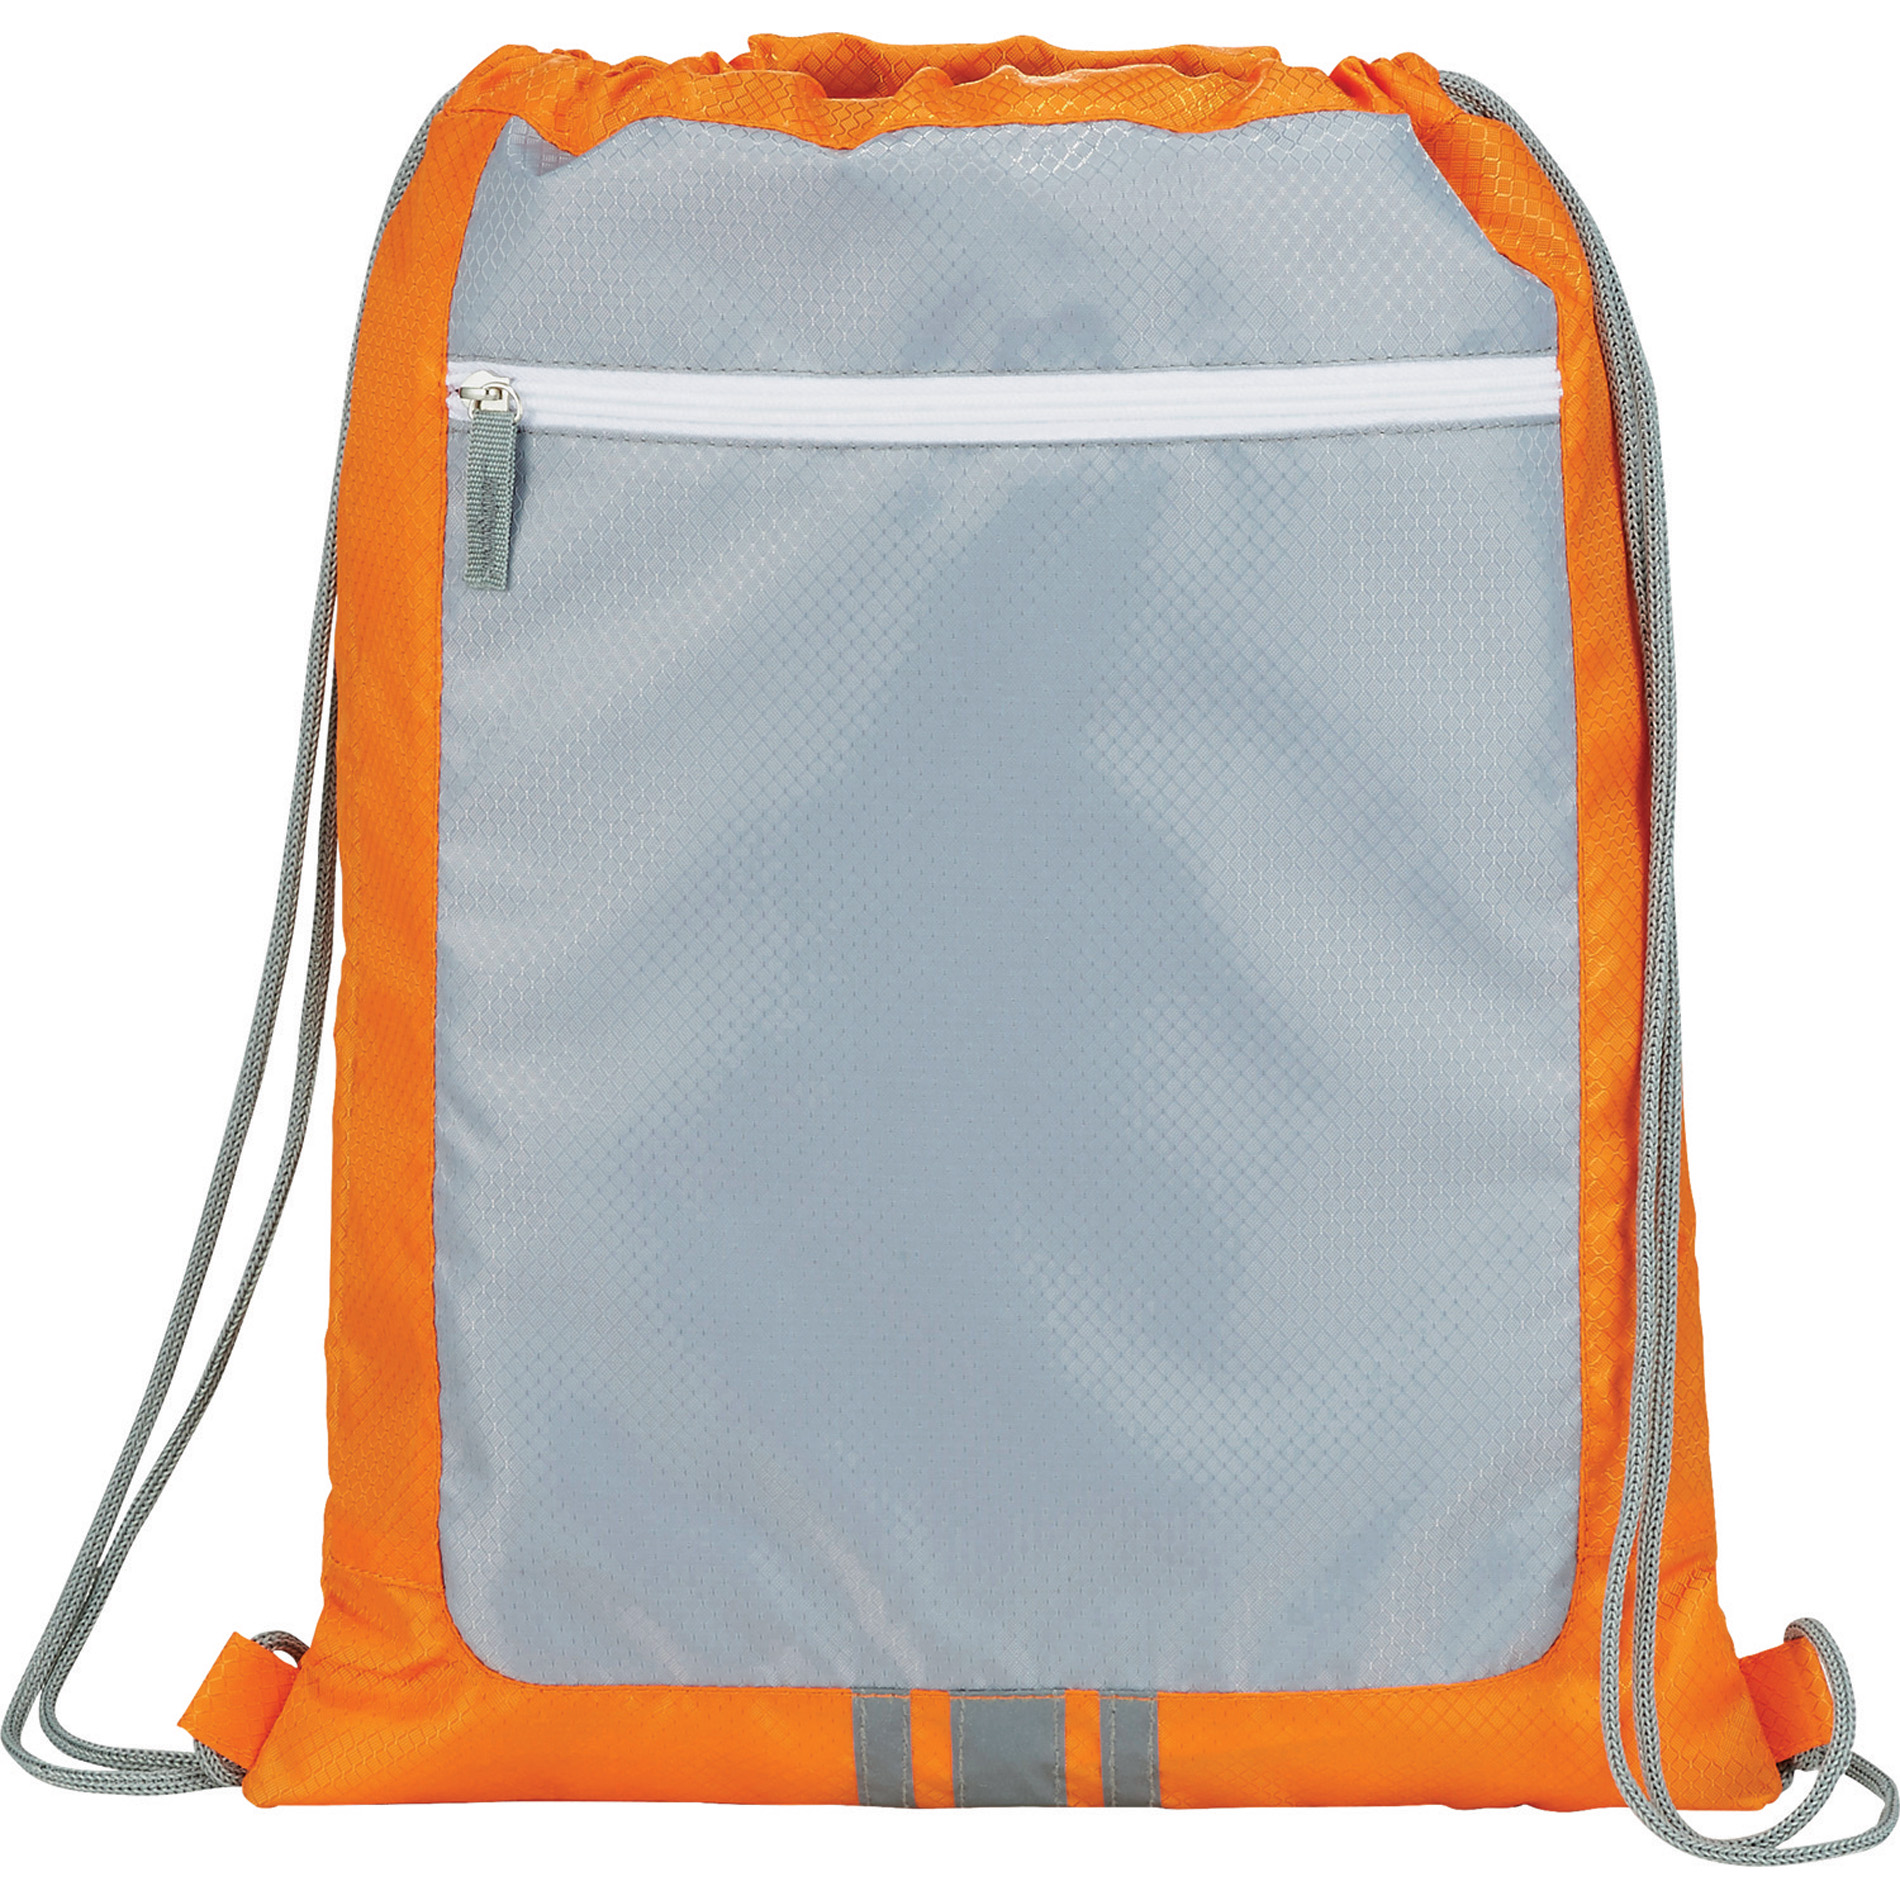 LEEDS 6760-63 - Frame Drawstring Sportspack